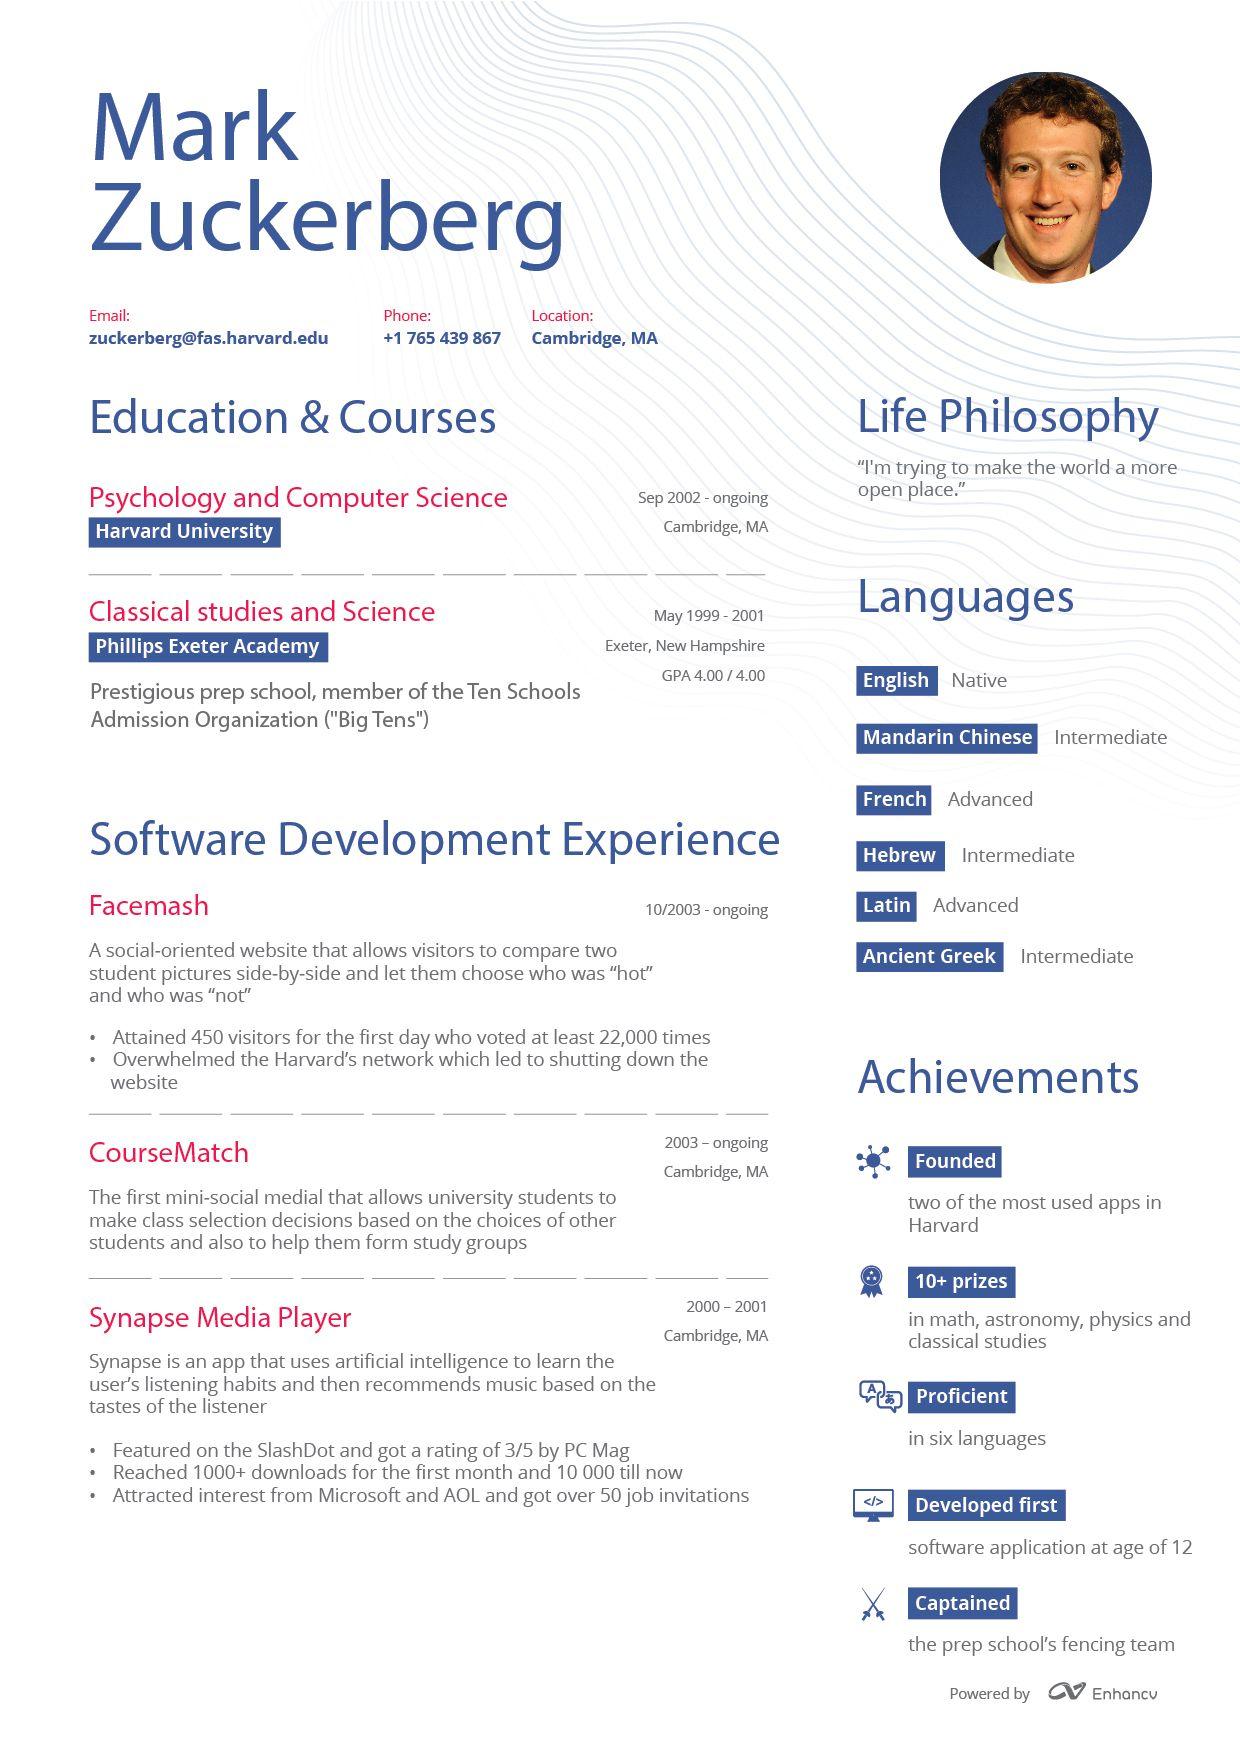 Curriculum Vitae Una Pagina Modelos De Curriculum Vitae Curriculum Vitae Como Hacer Un Curriculum